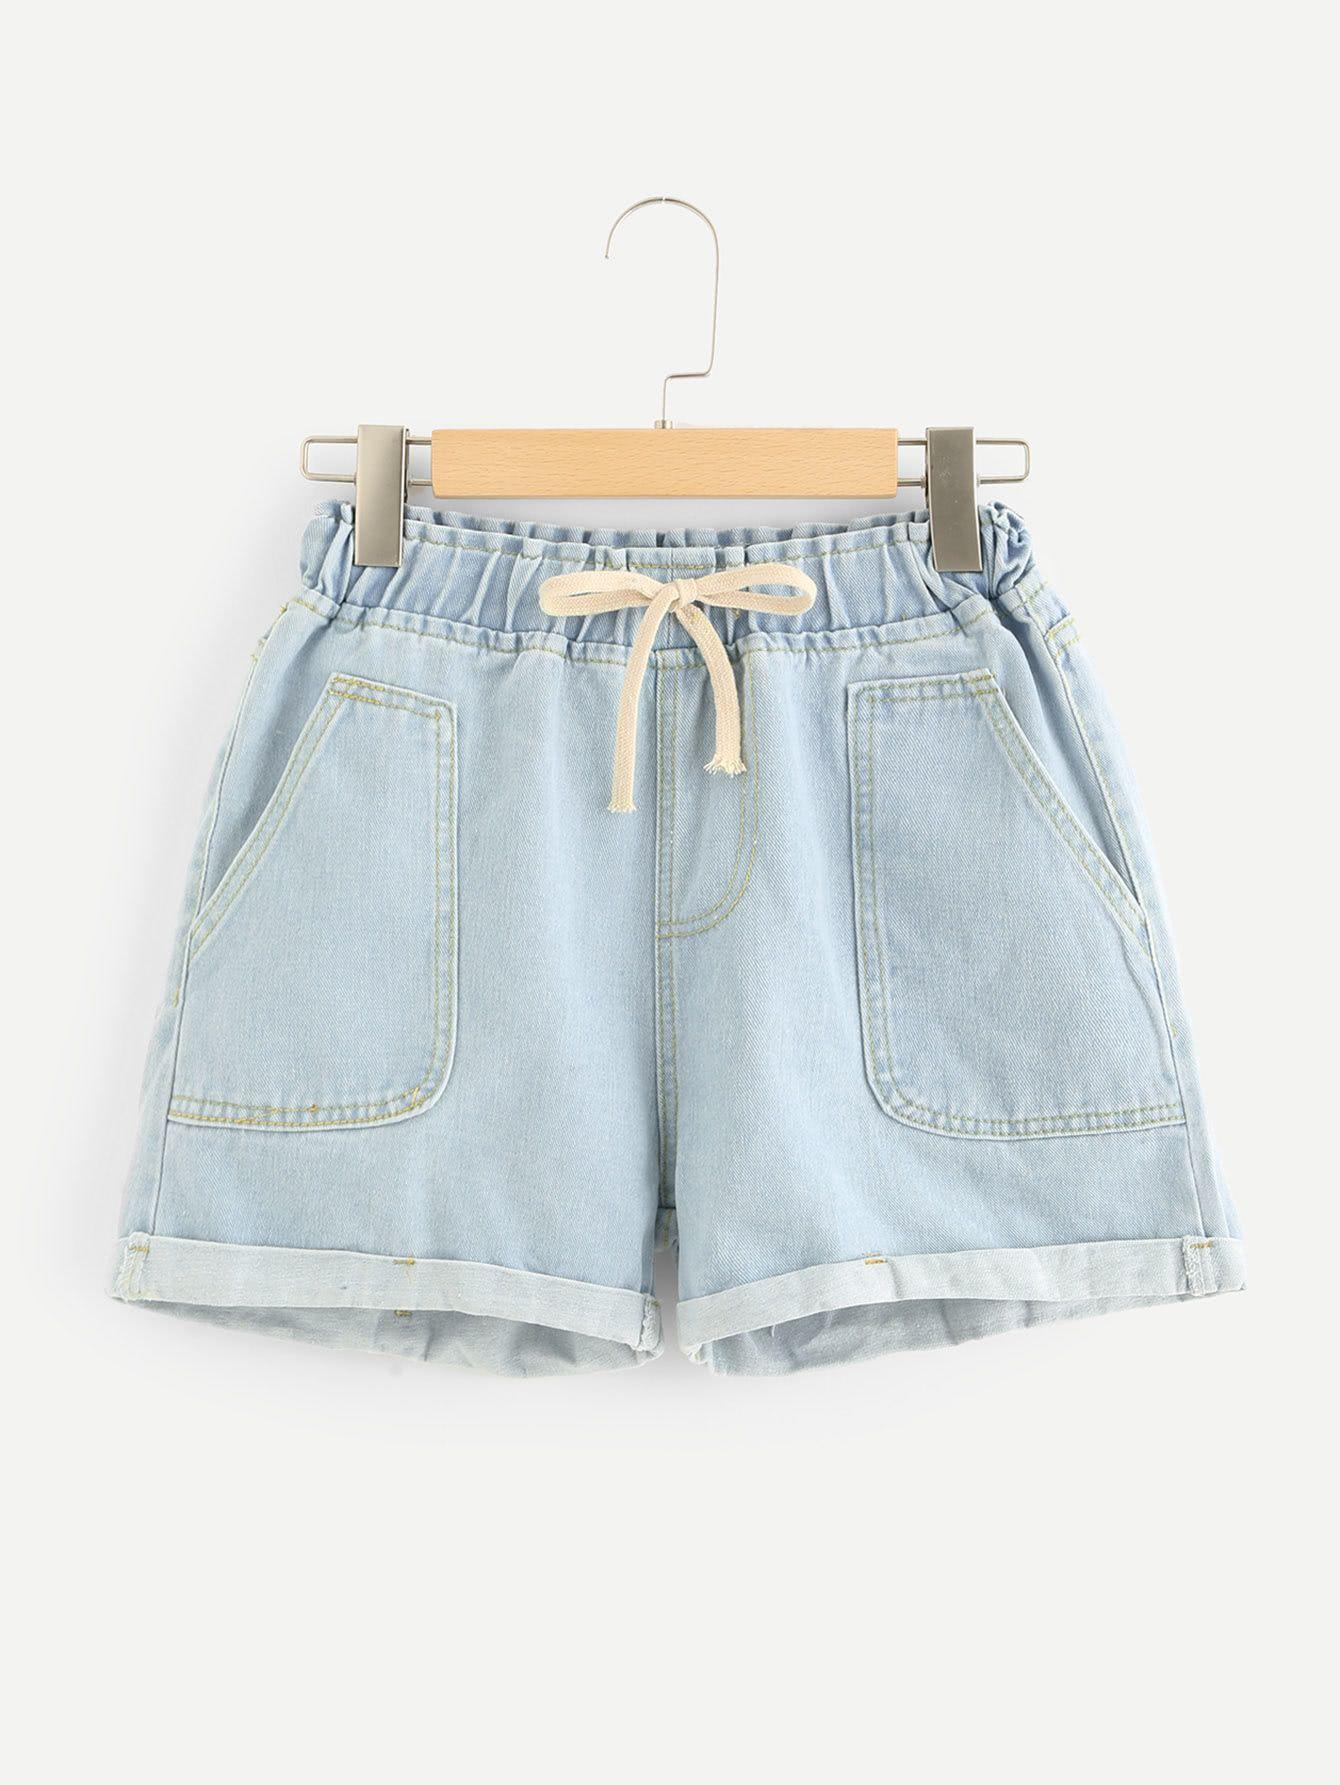 446697a96d Dual Pocket Drawstring Waist Denim Shorts in 2019   My stitch fix ...